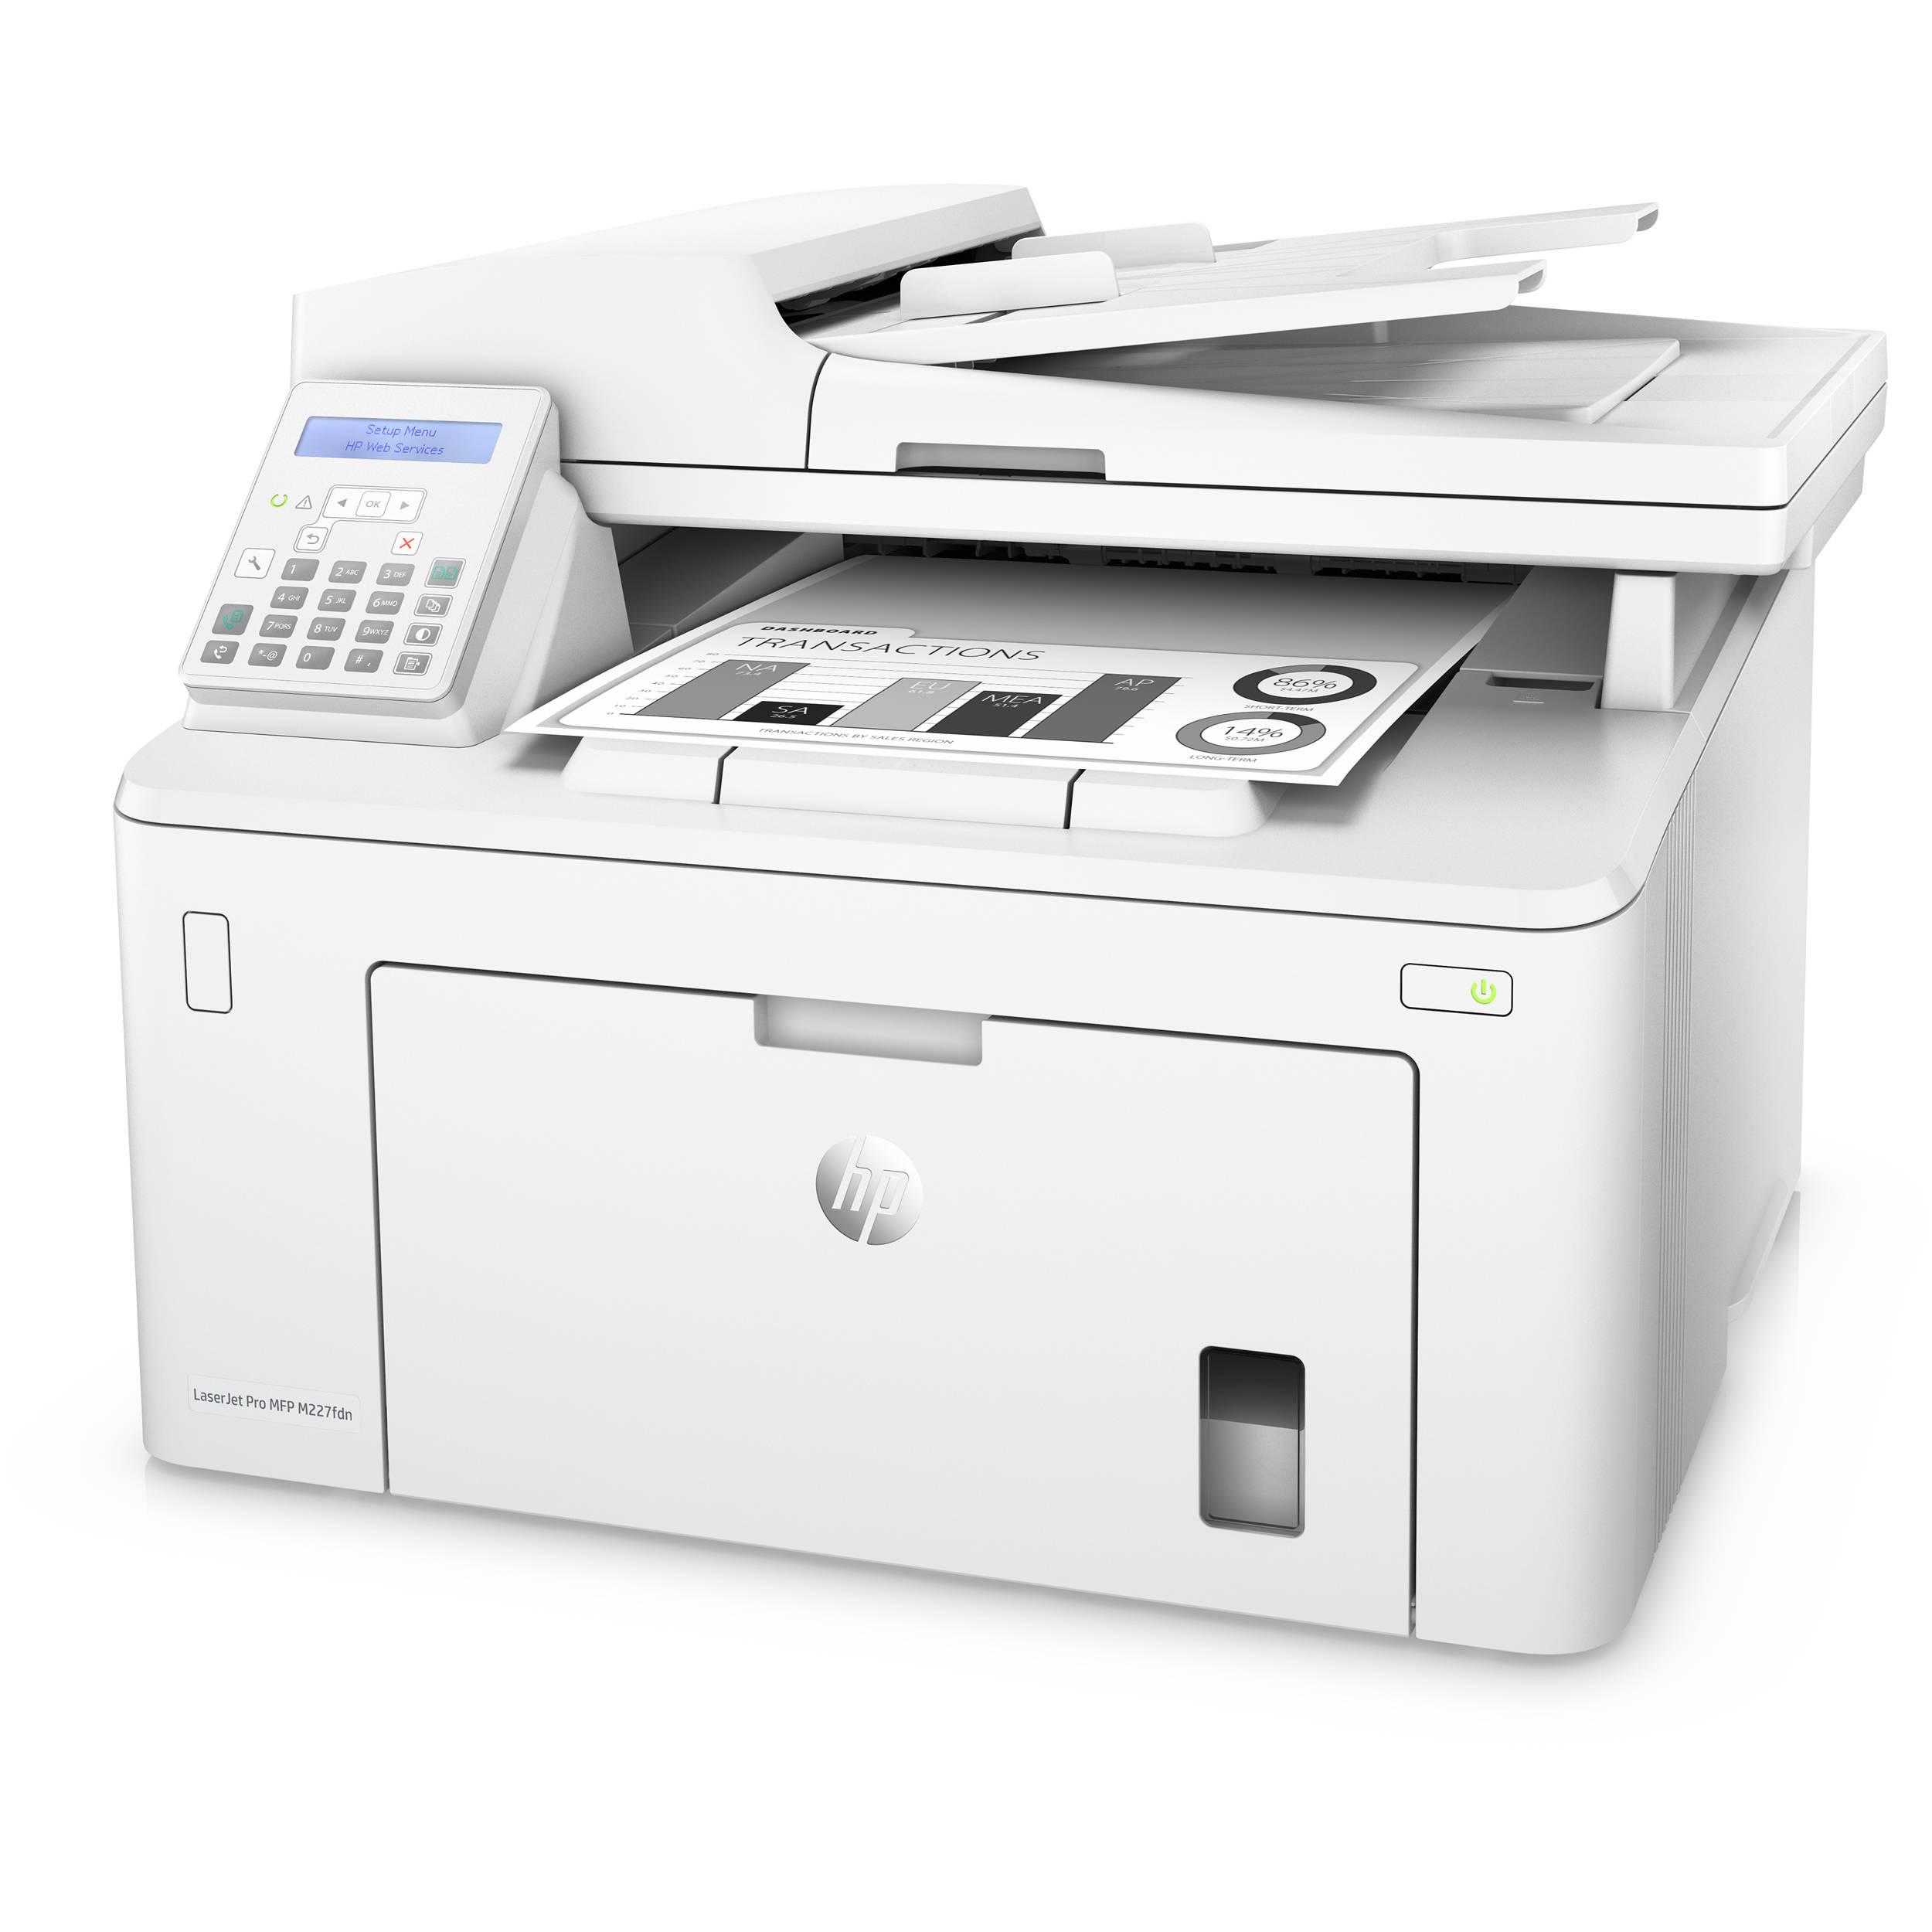 Jual Harga HP LaserJet Pro MFP M227fdn (G3Q79A)